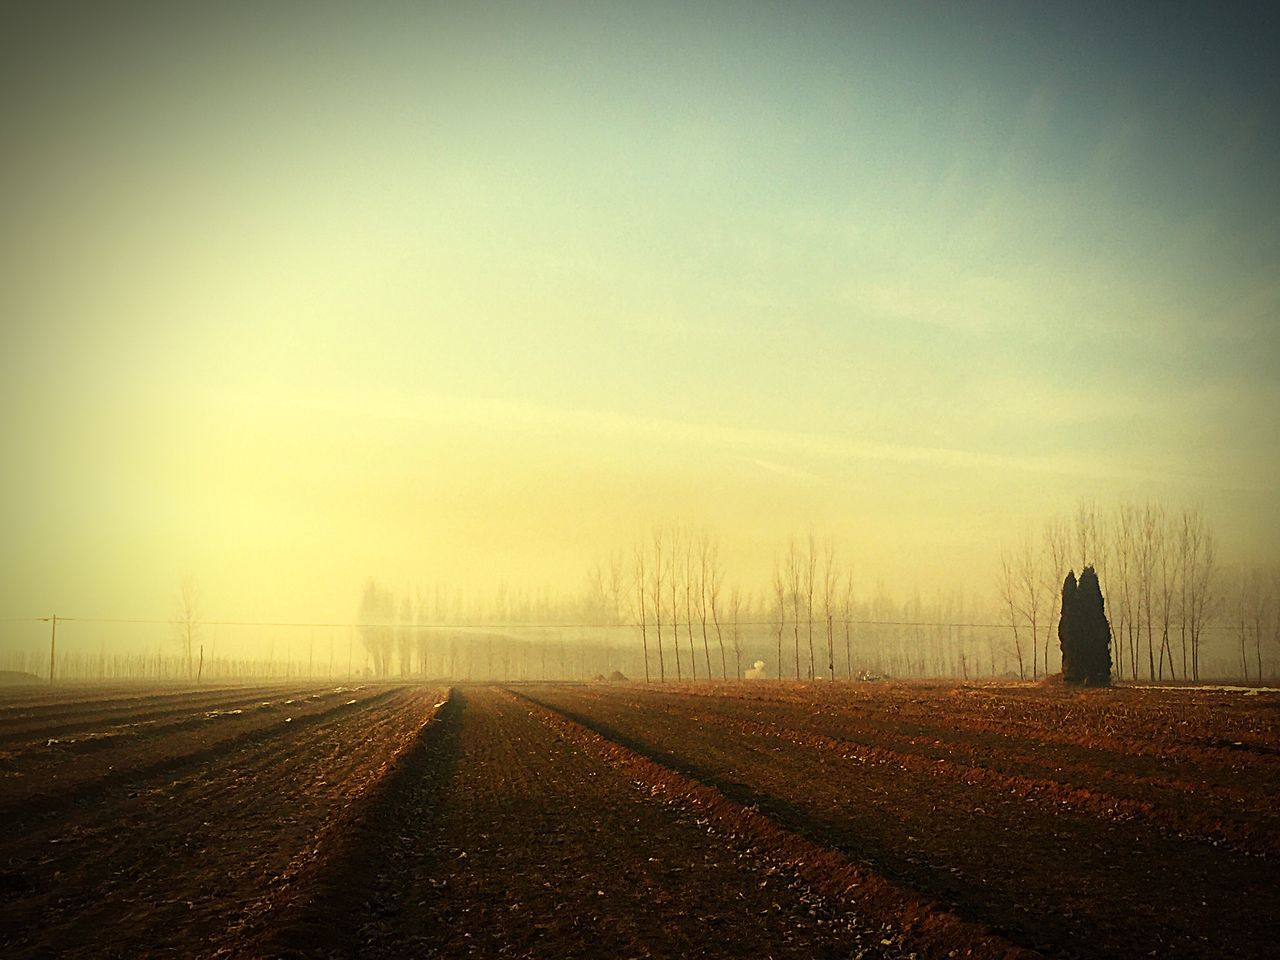 Narrow Road Along Landscape